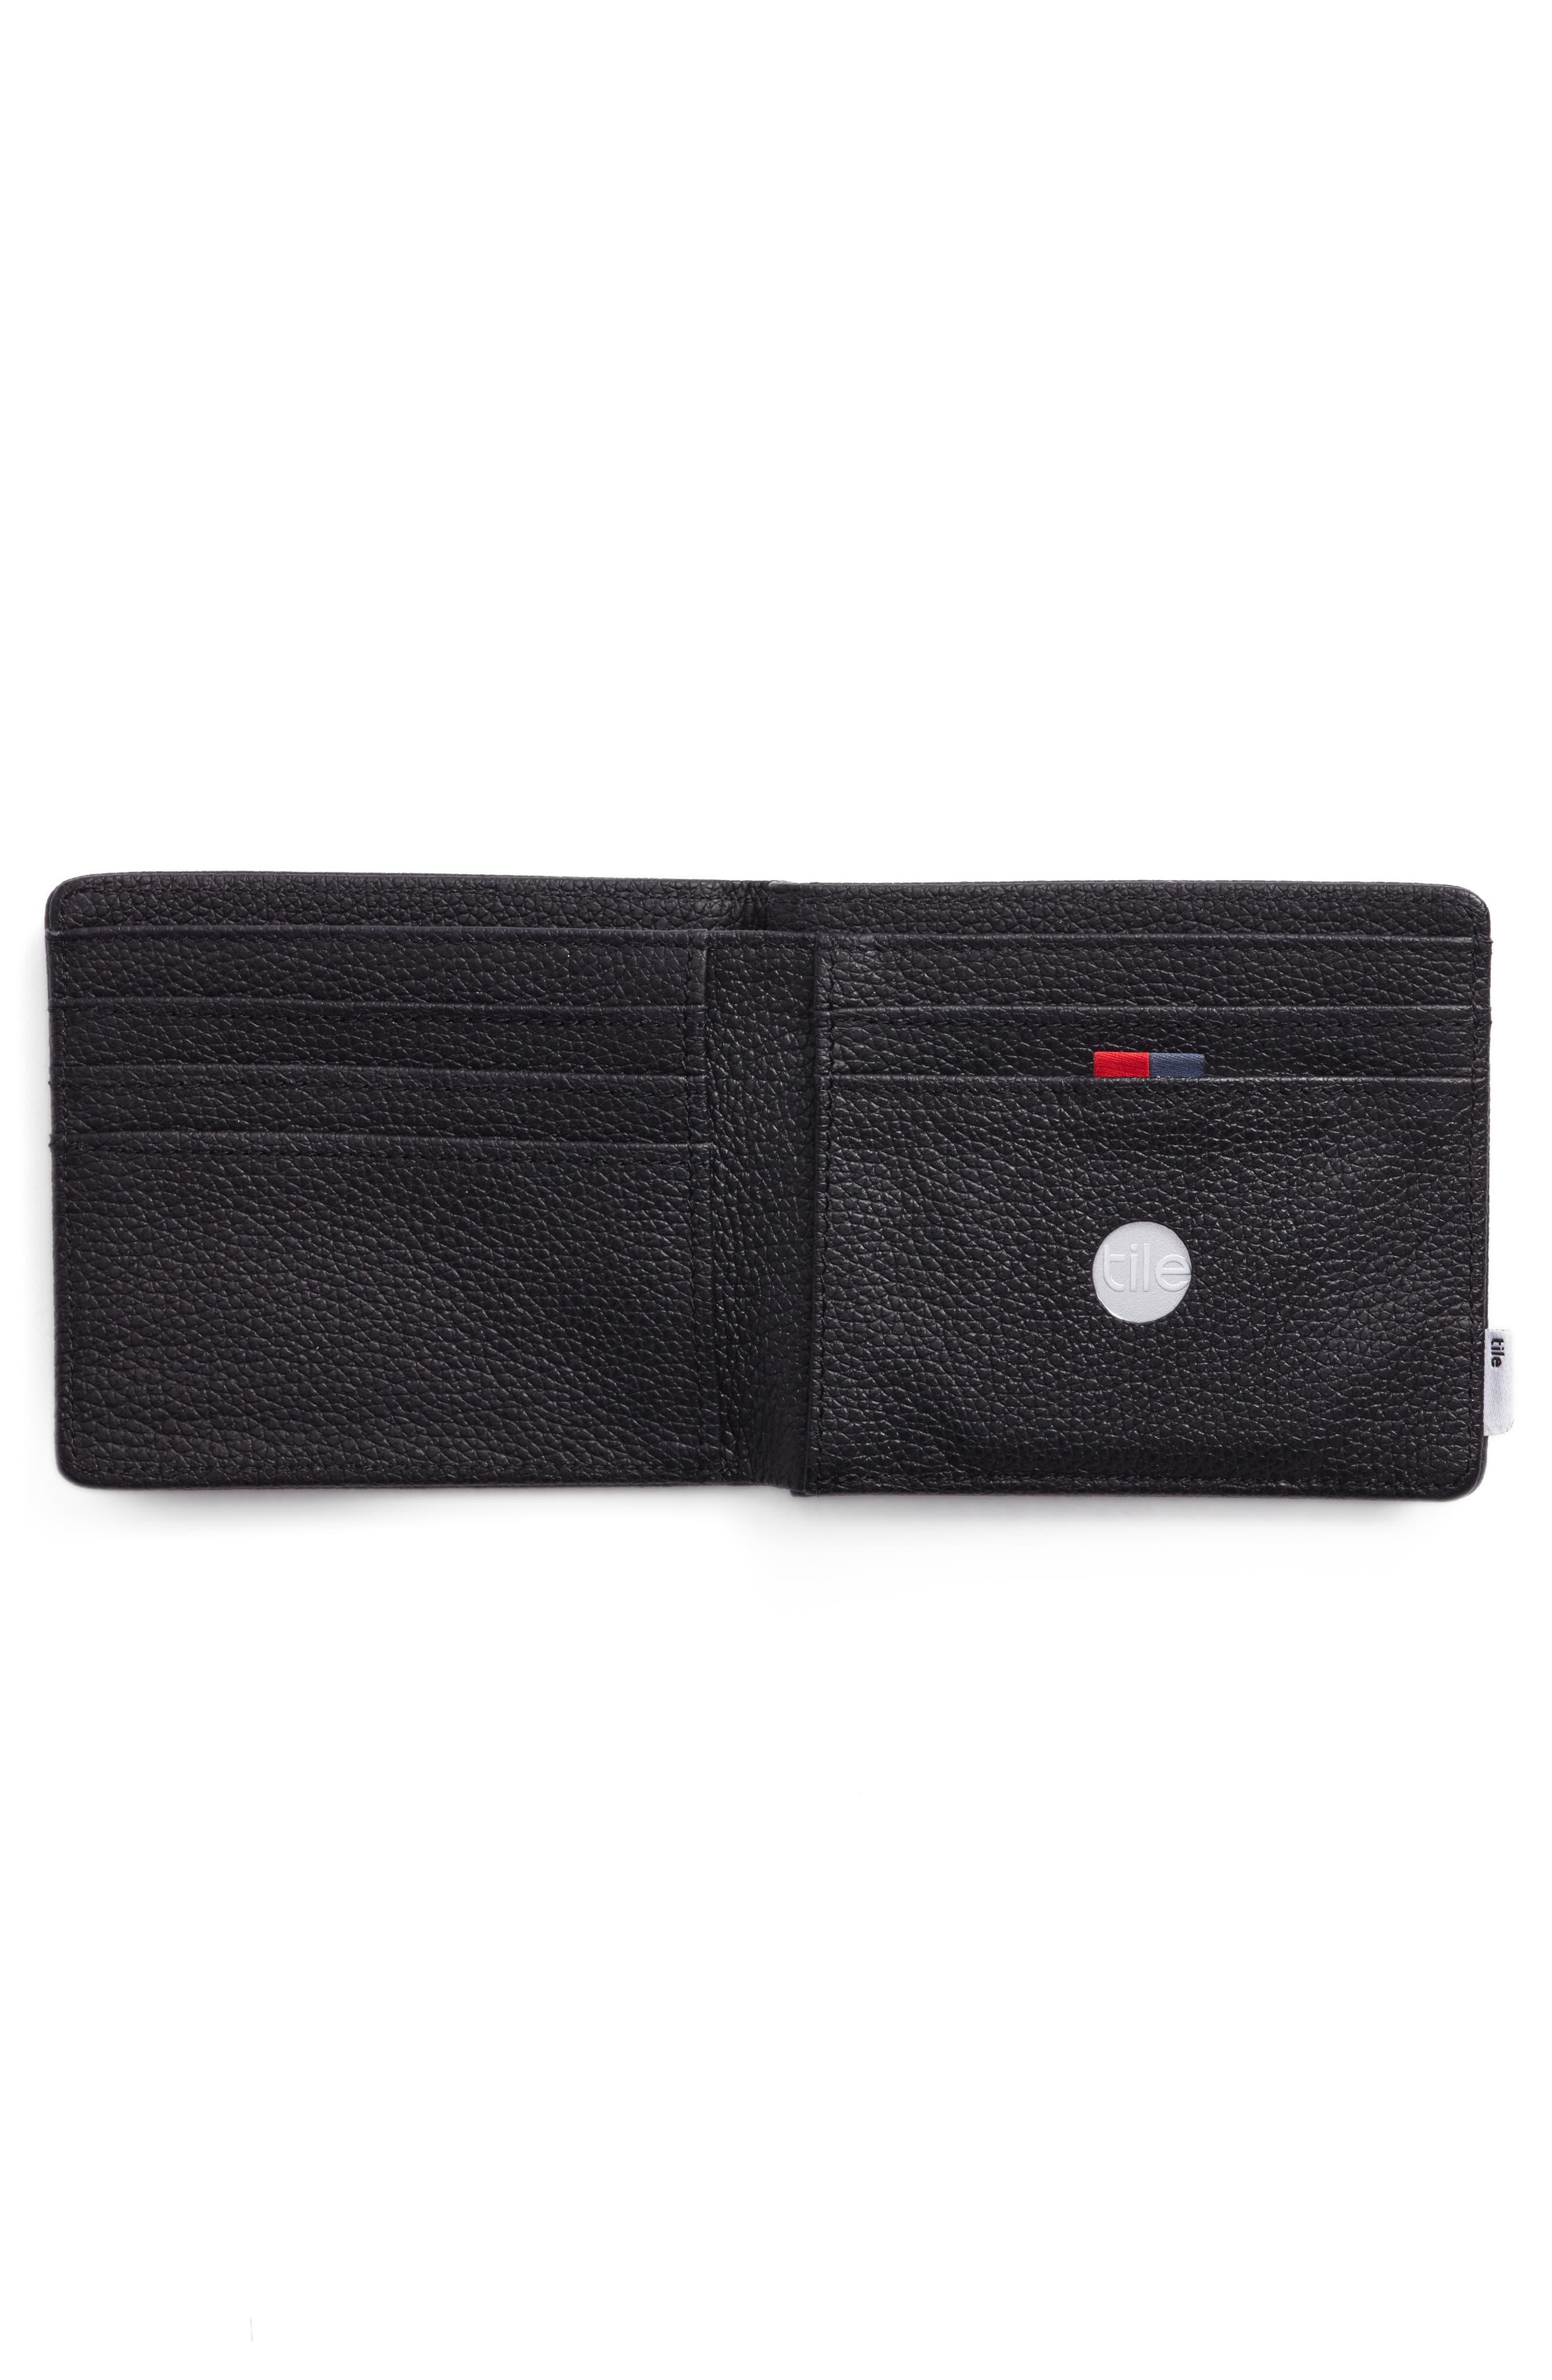 Tile Roy Leather Wallet,                             Alternate thumbnail 2, color,                             Black Pebbled Leather